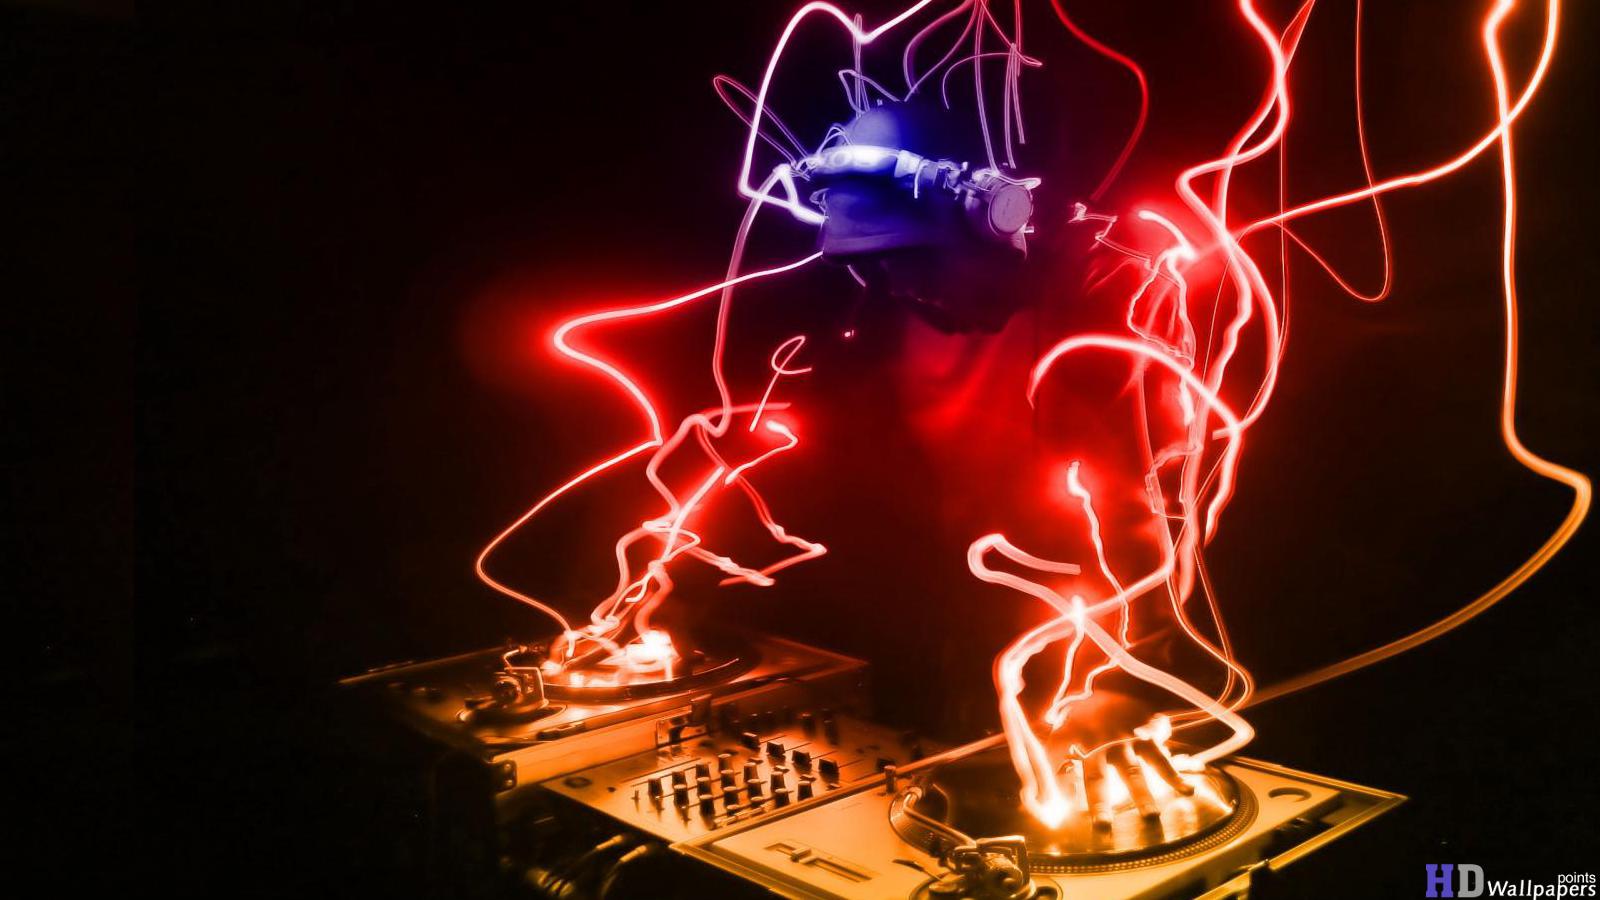 Music DJ 3D Wallpapers HD Wallpaper 1600x900